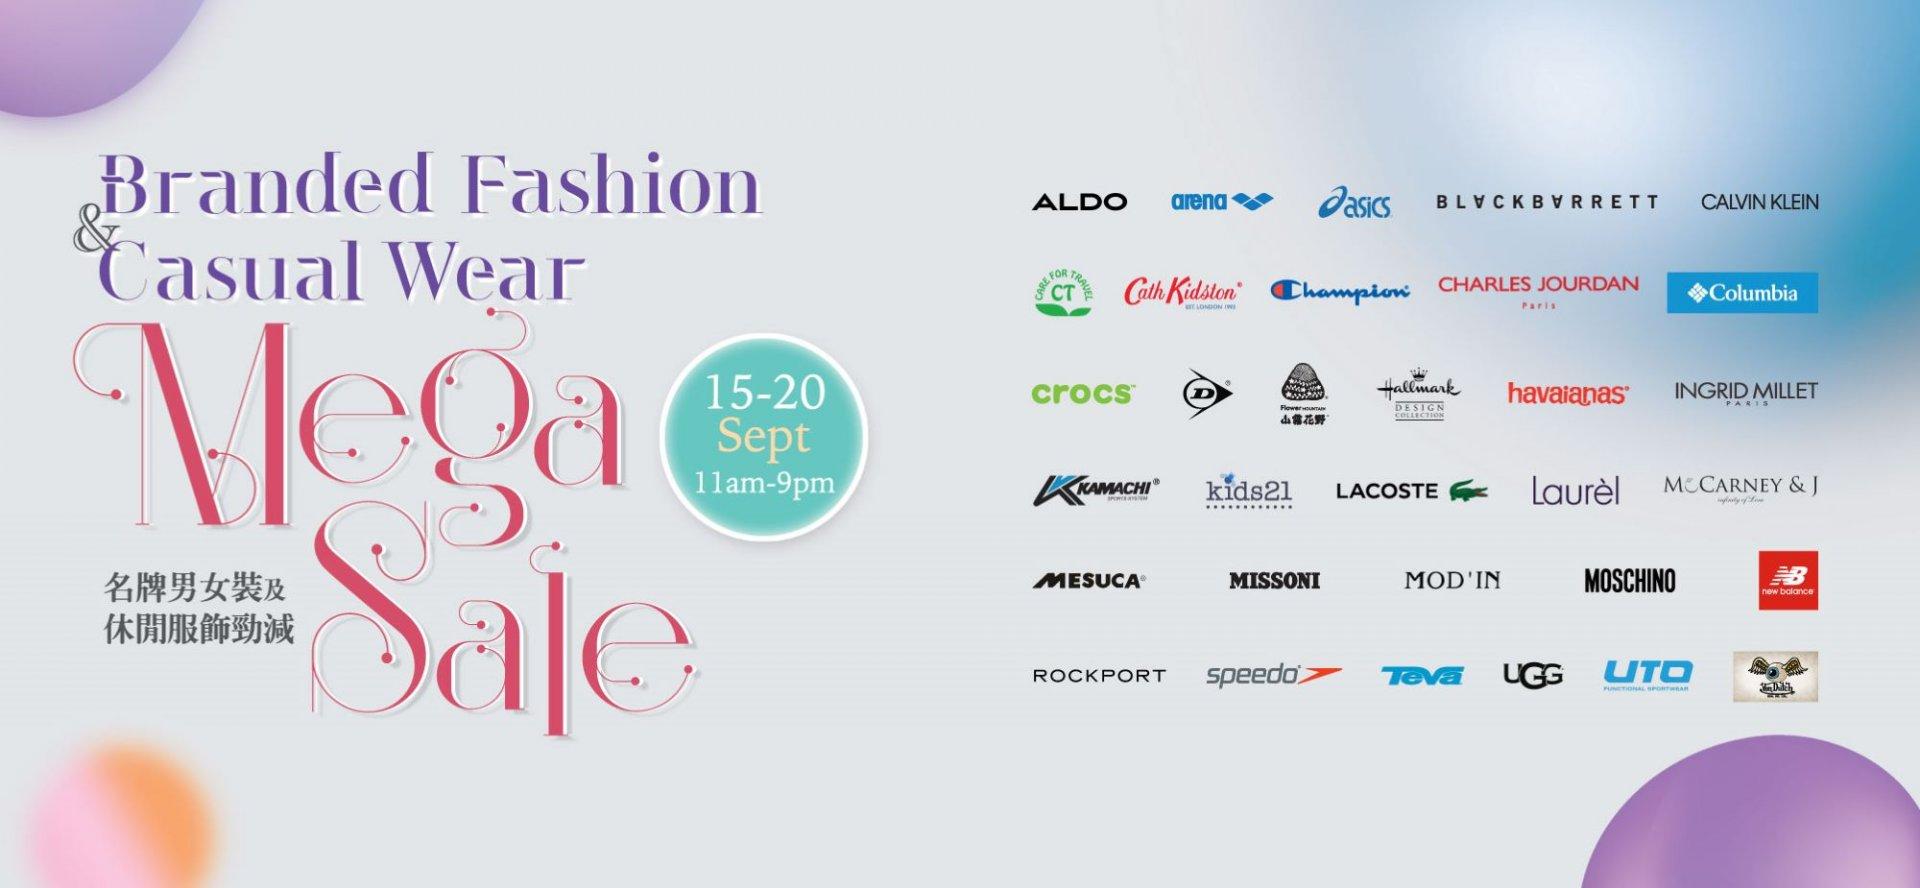 Branded Fashion & Casual Wear Mega Sale